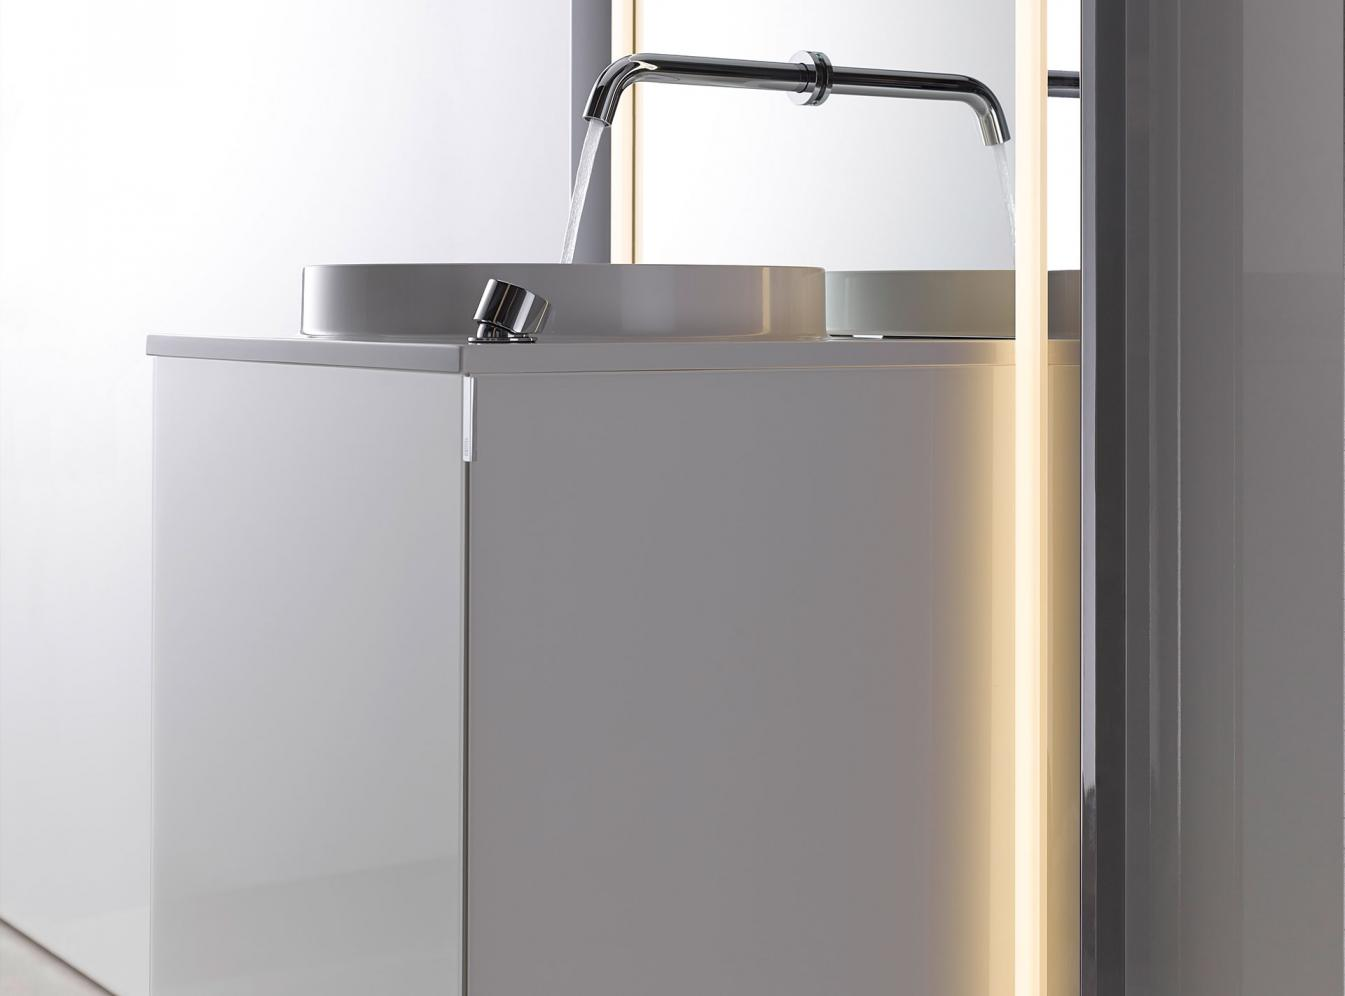 hochwertige accessoires von emco touch pure 450 optiwhite. Black Bedroom Furniture Sets. Home Design Ideas